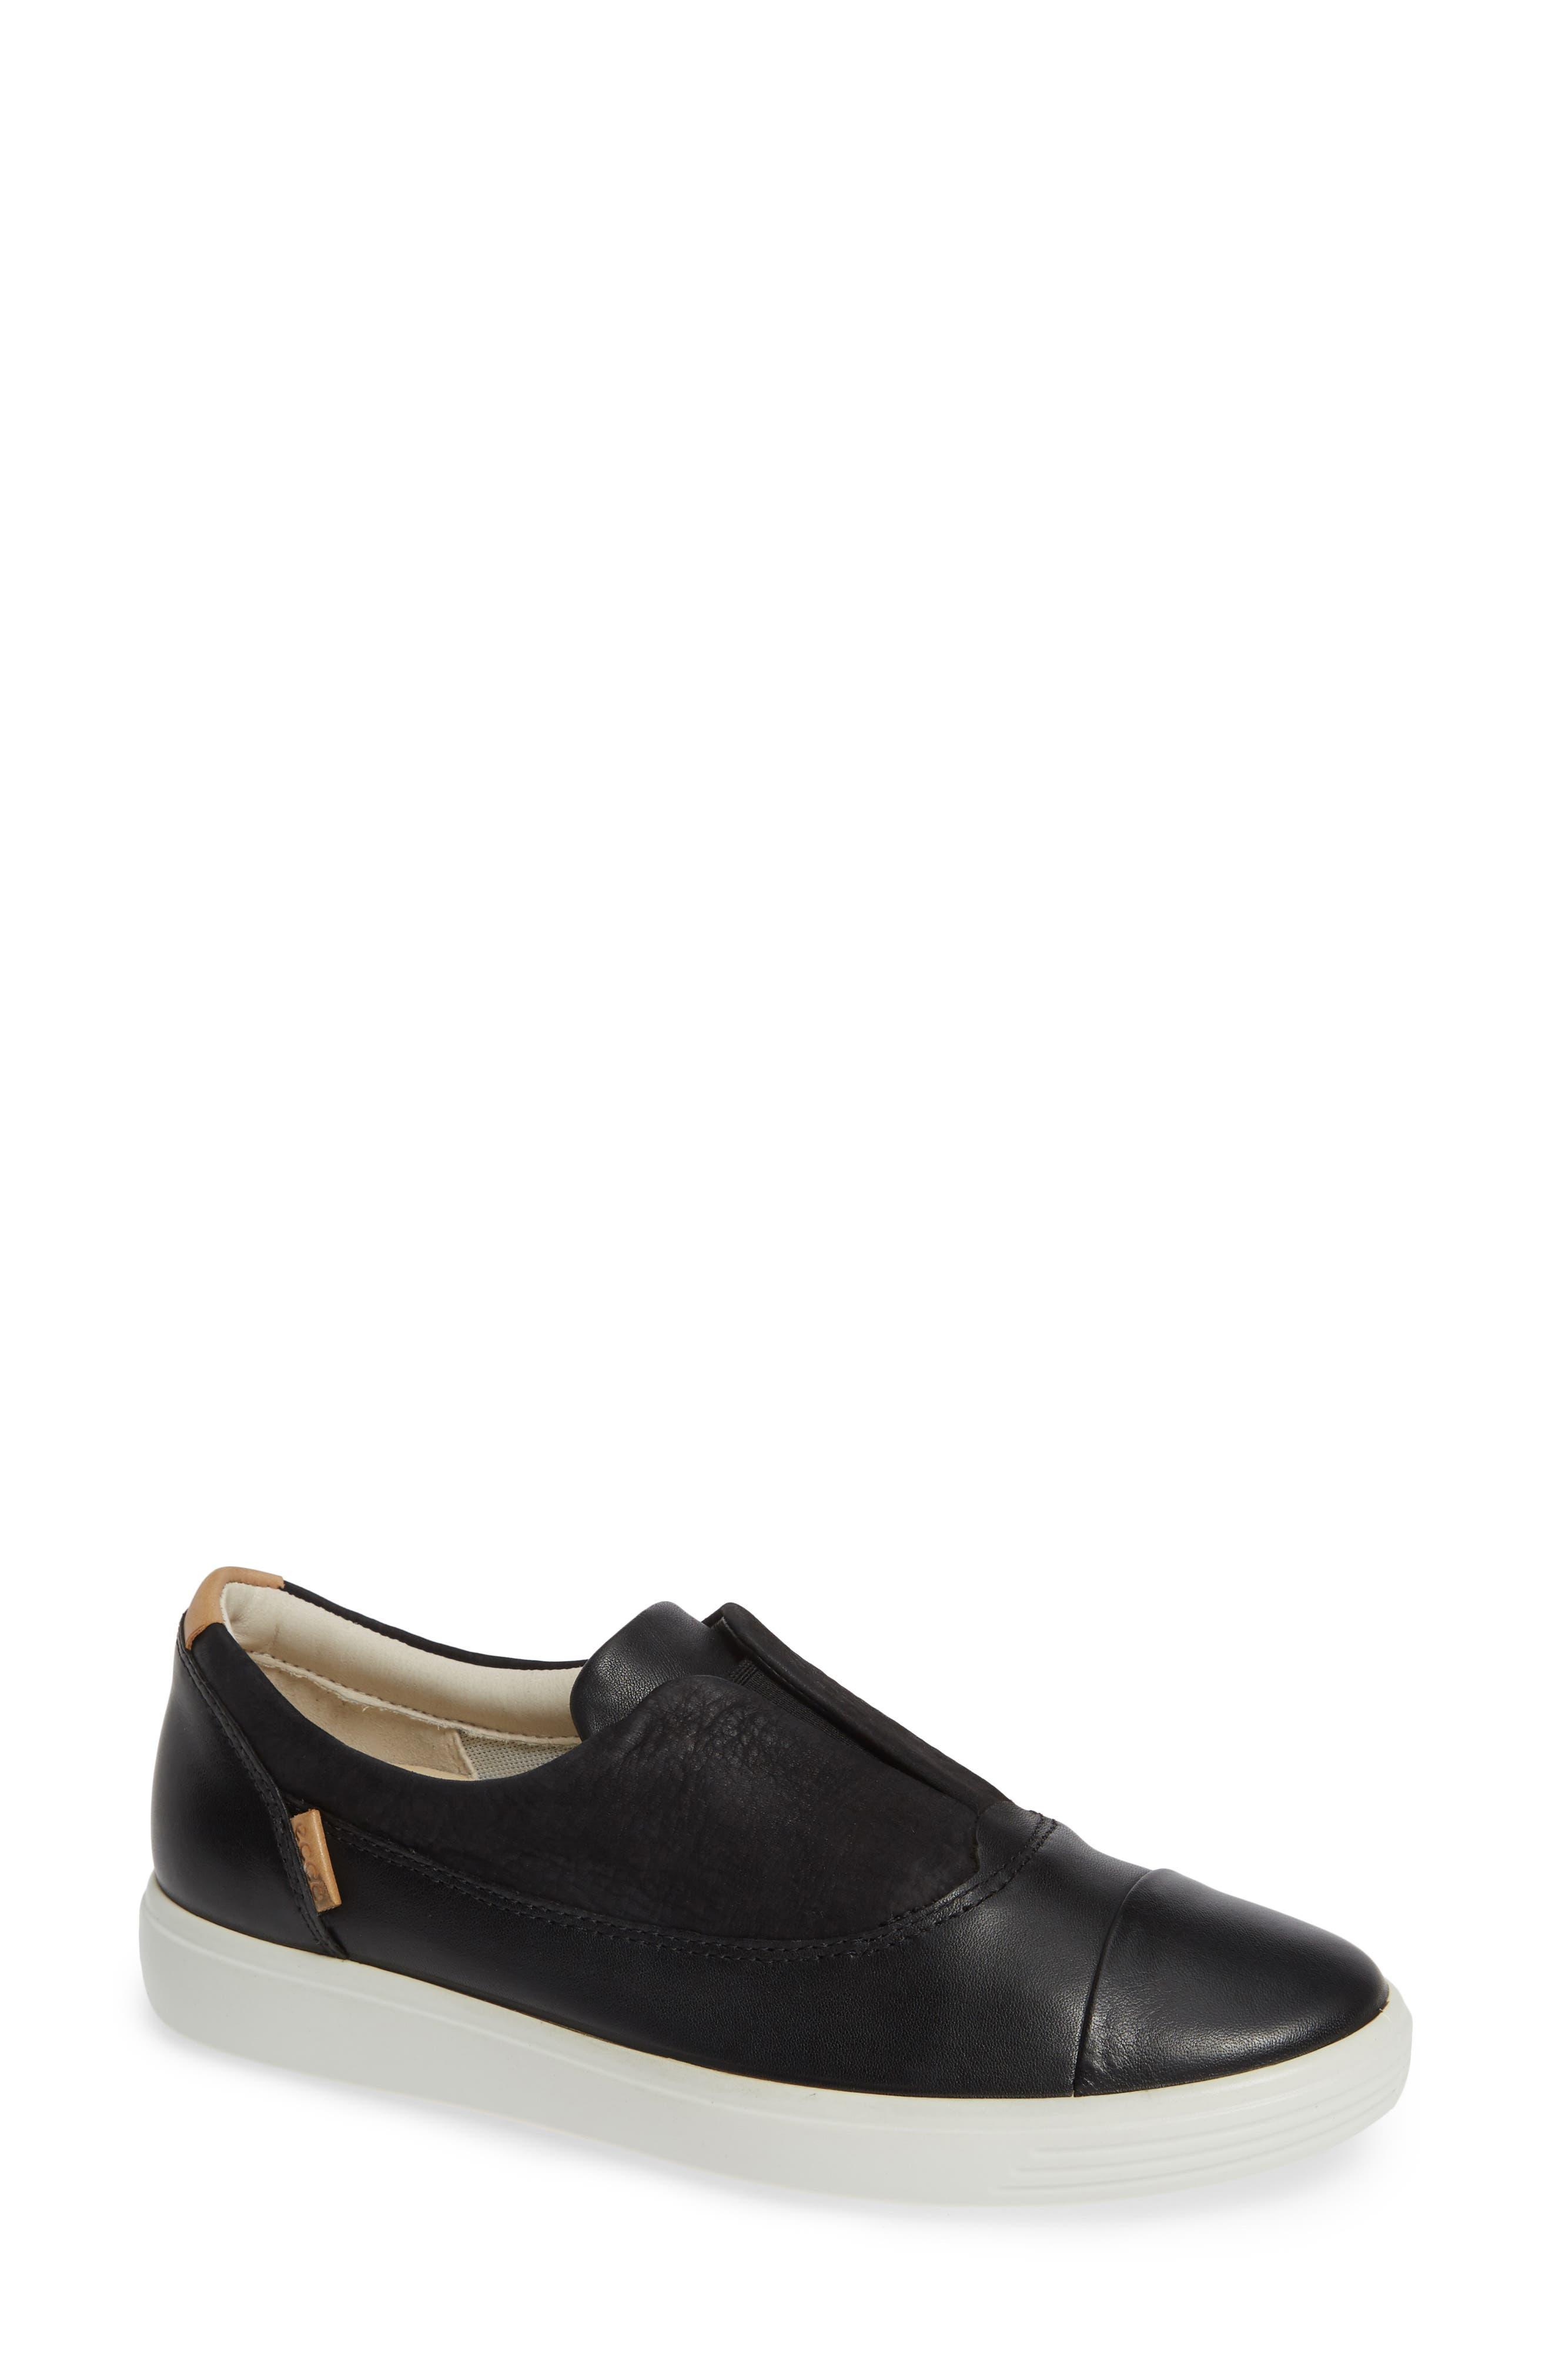 Soft 7 II Slip-On Sneaker, Main, color, 001